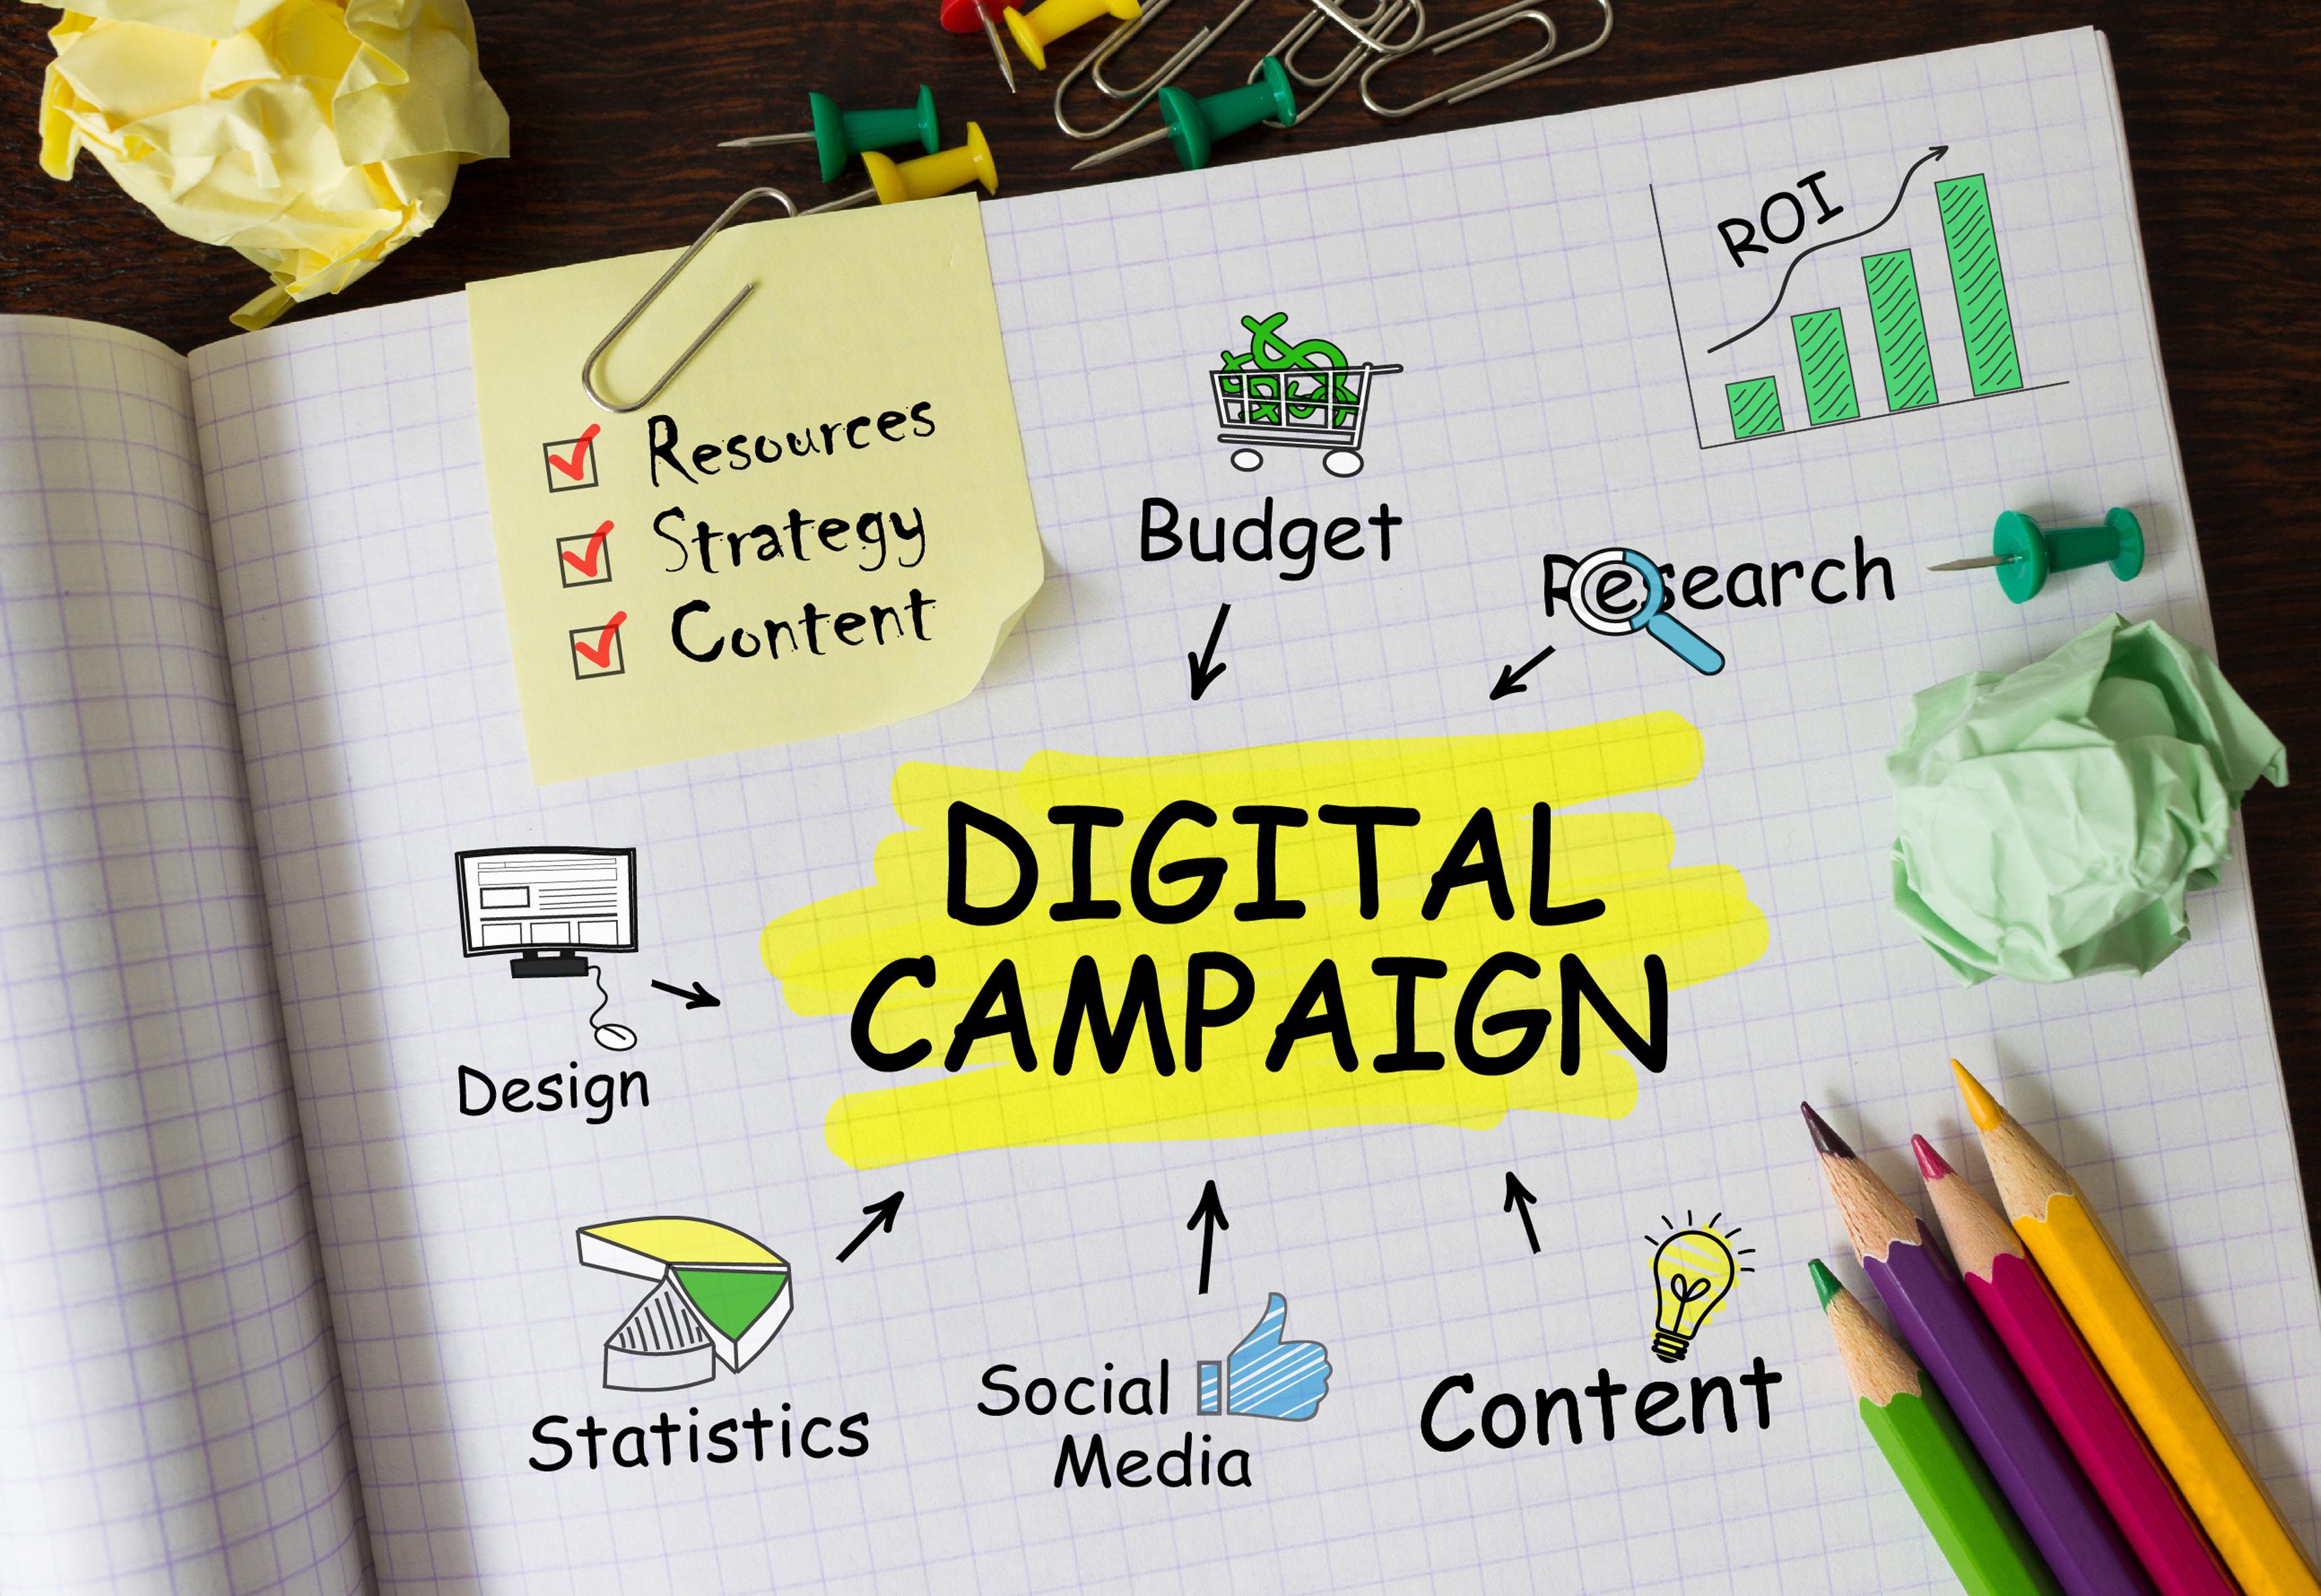 Digital Campaign